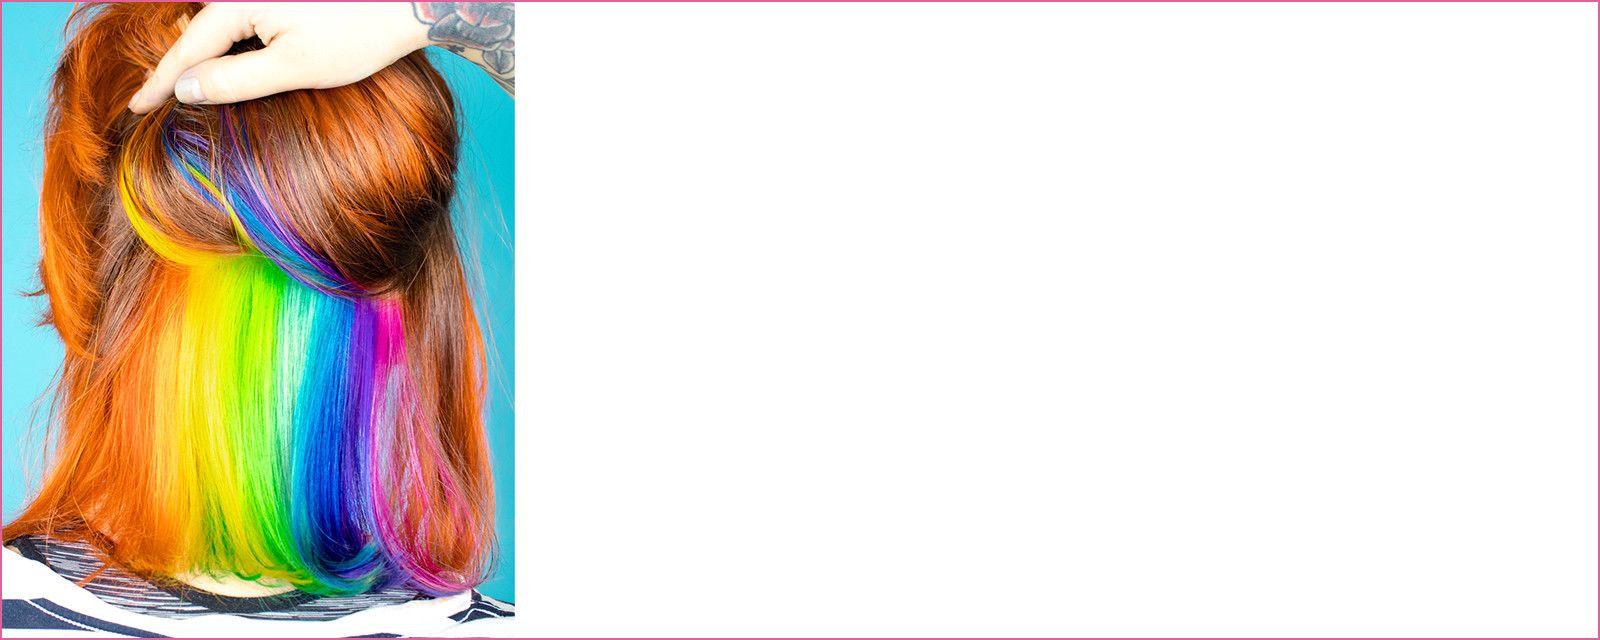 Nett Supercuts Las Cruces Nm In 2020 Cruelty Free Hair Dye Hair Color Mahogany Semi Permanent Hair Dye